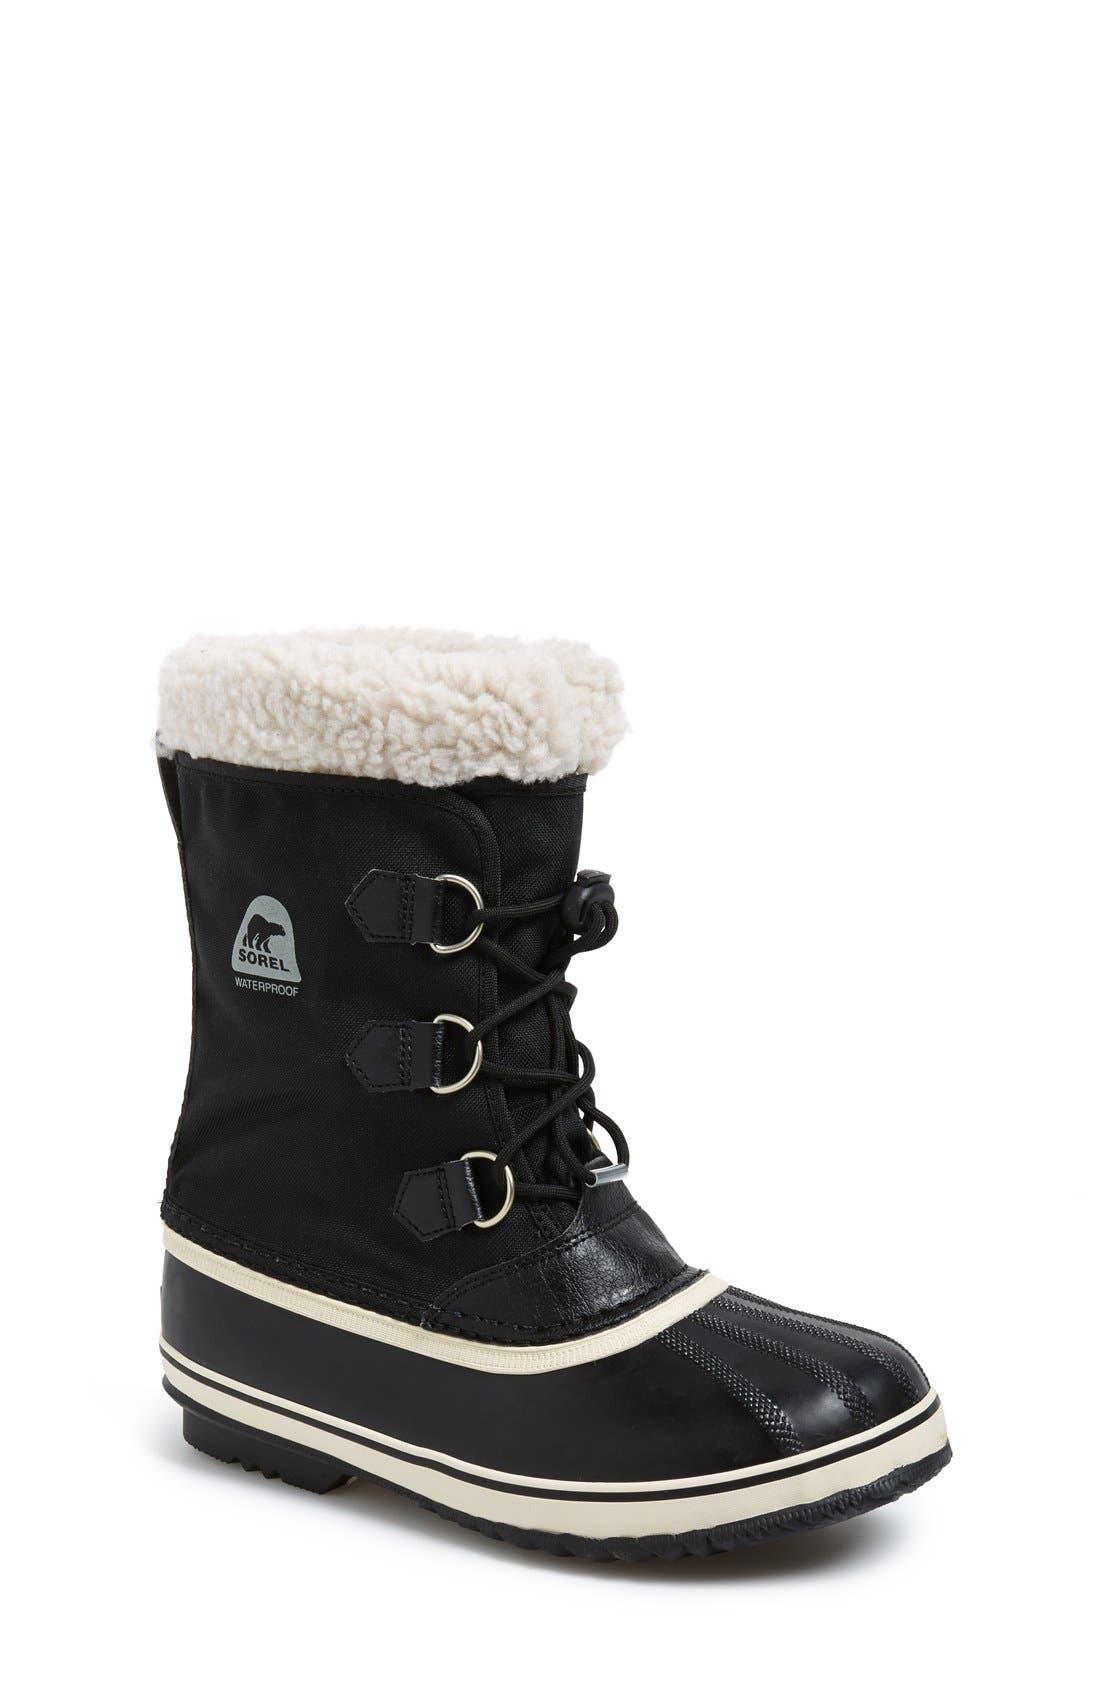 Main Image - SOREL 'Yoot Pac' Waterproof Snow Boot (Toddler, Little Kid